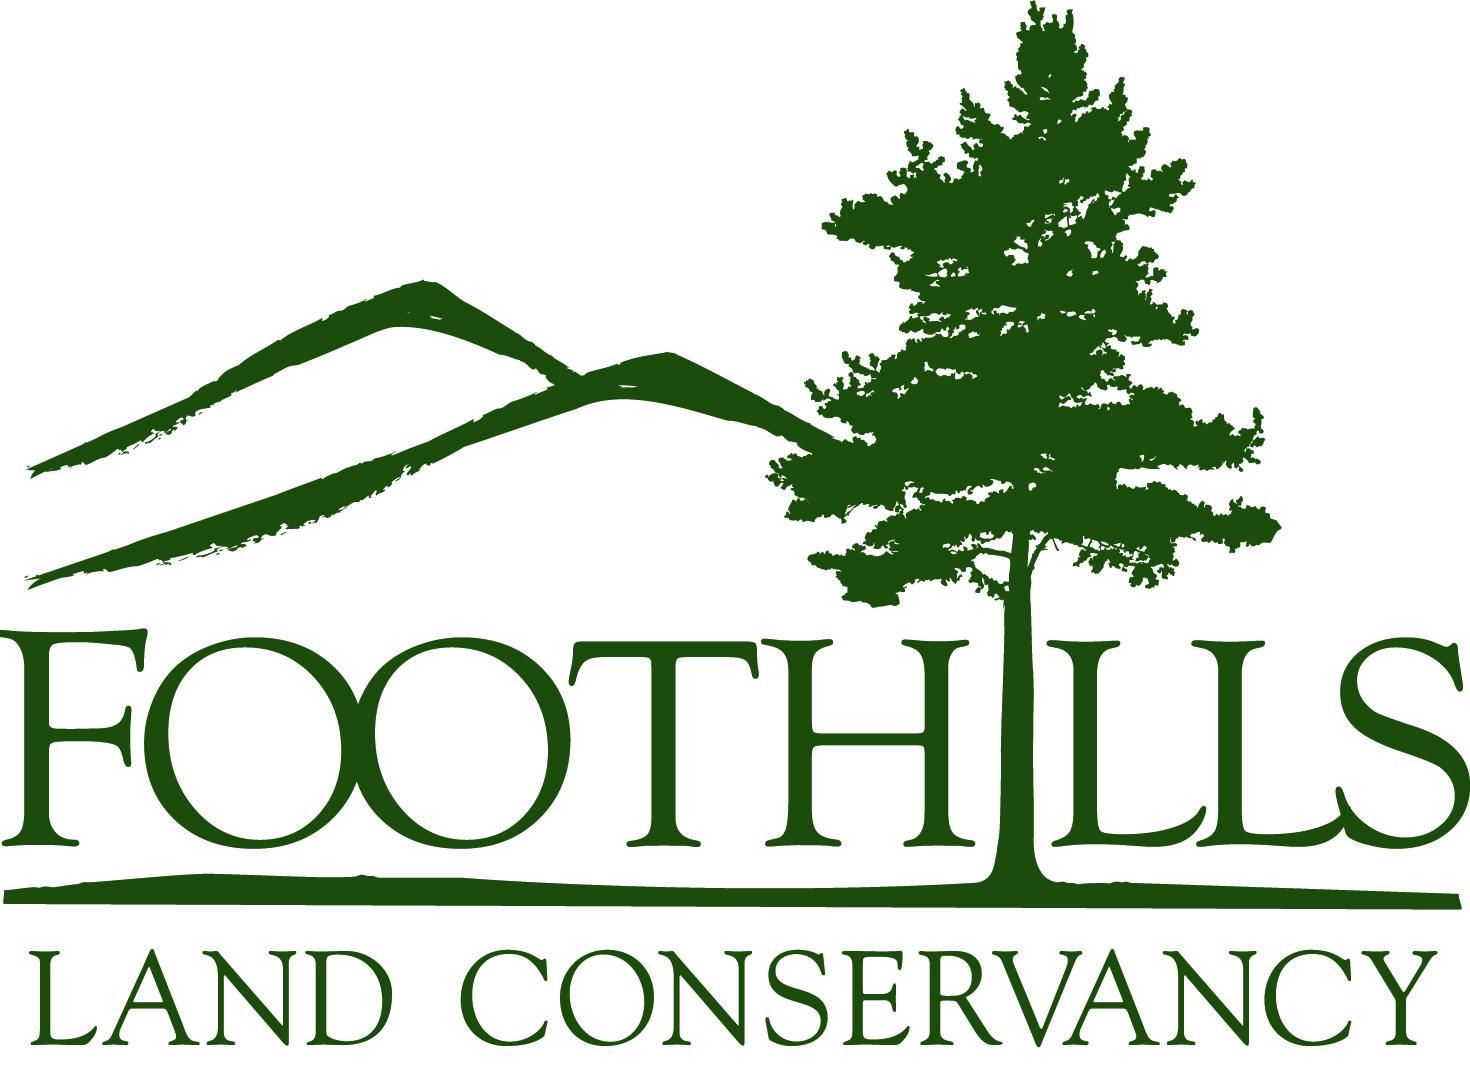 foothills land conservancy